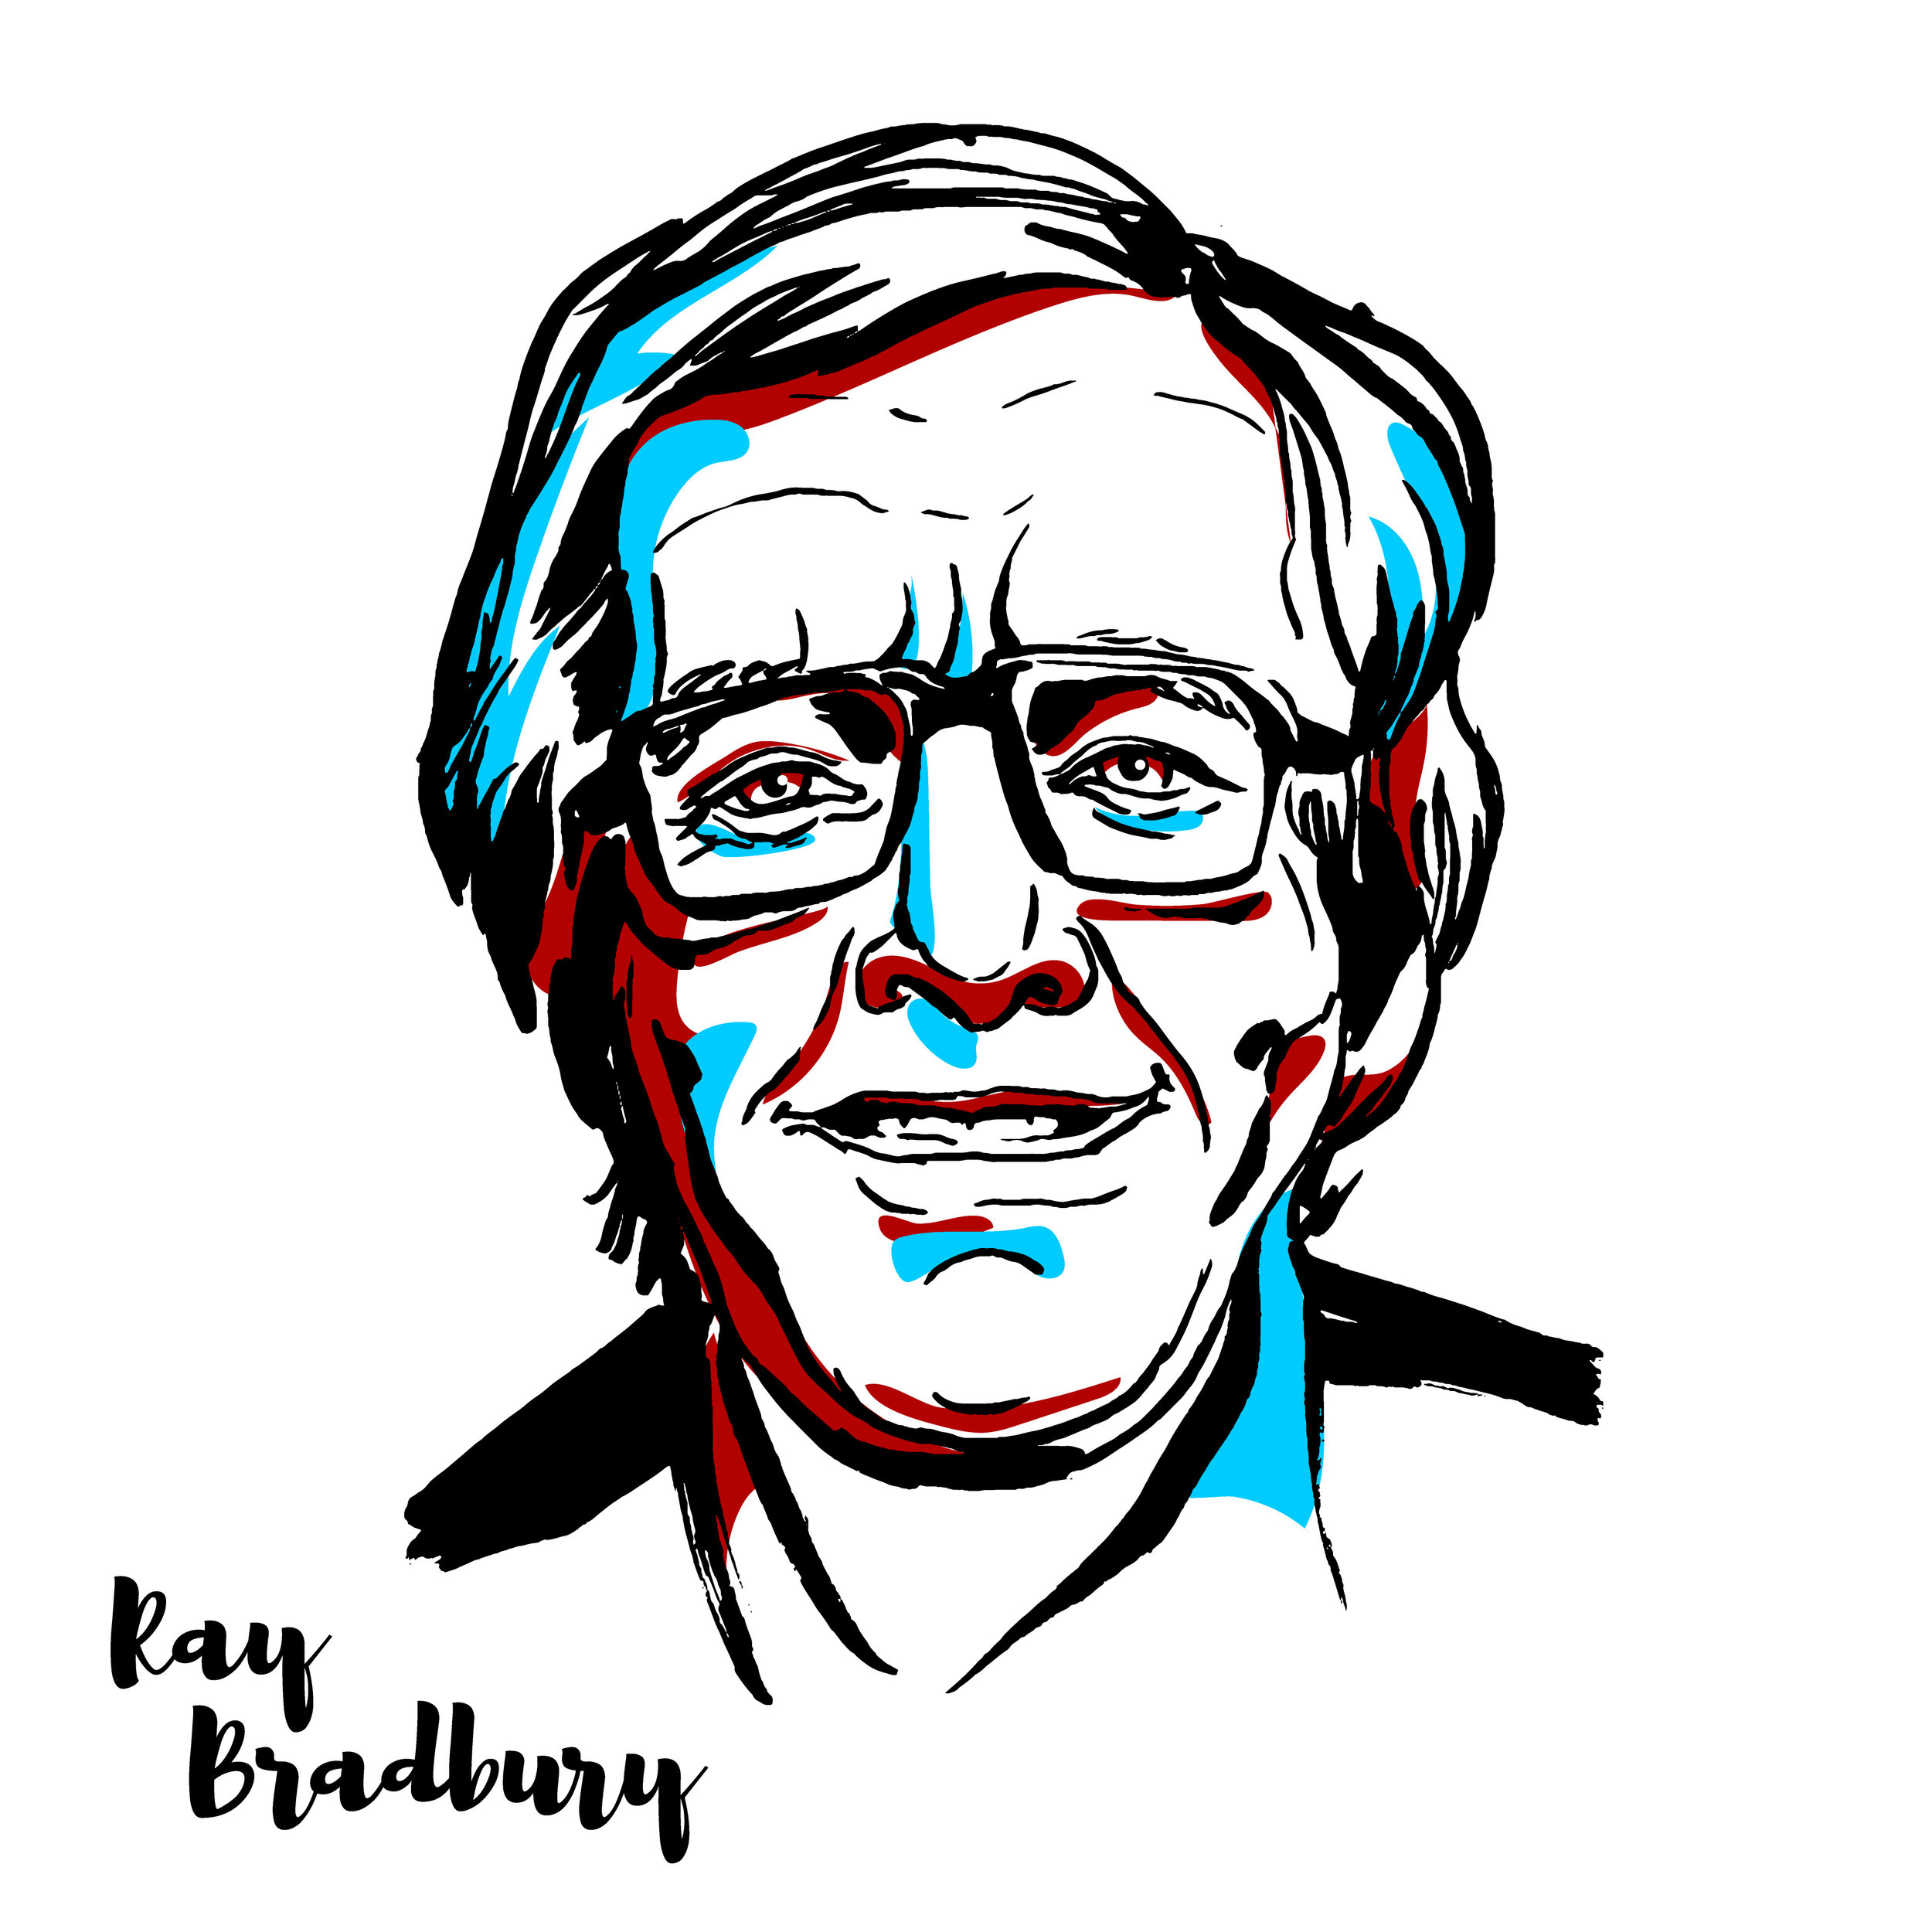 Ray_Bradbury.jpg